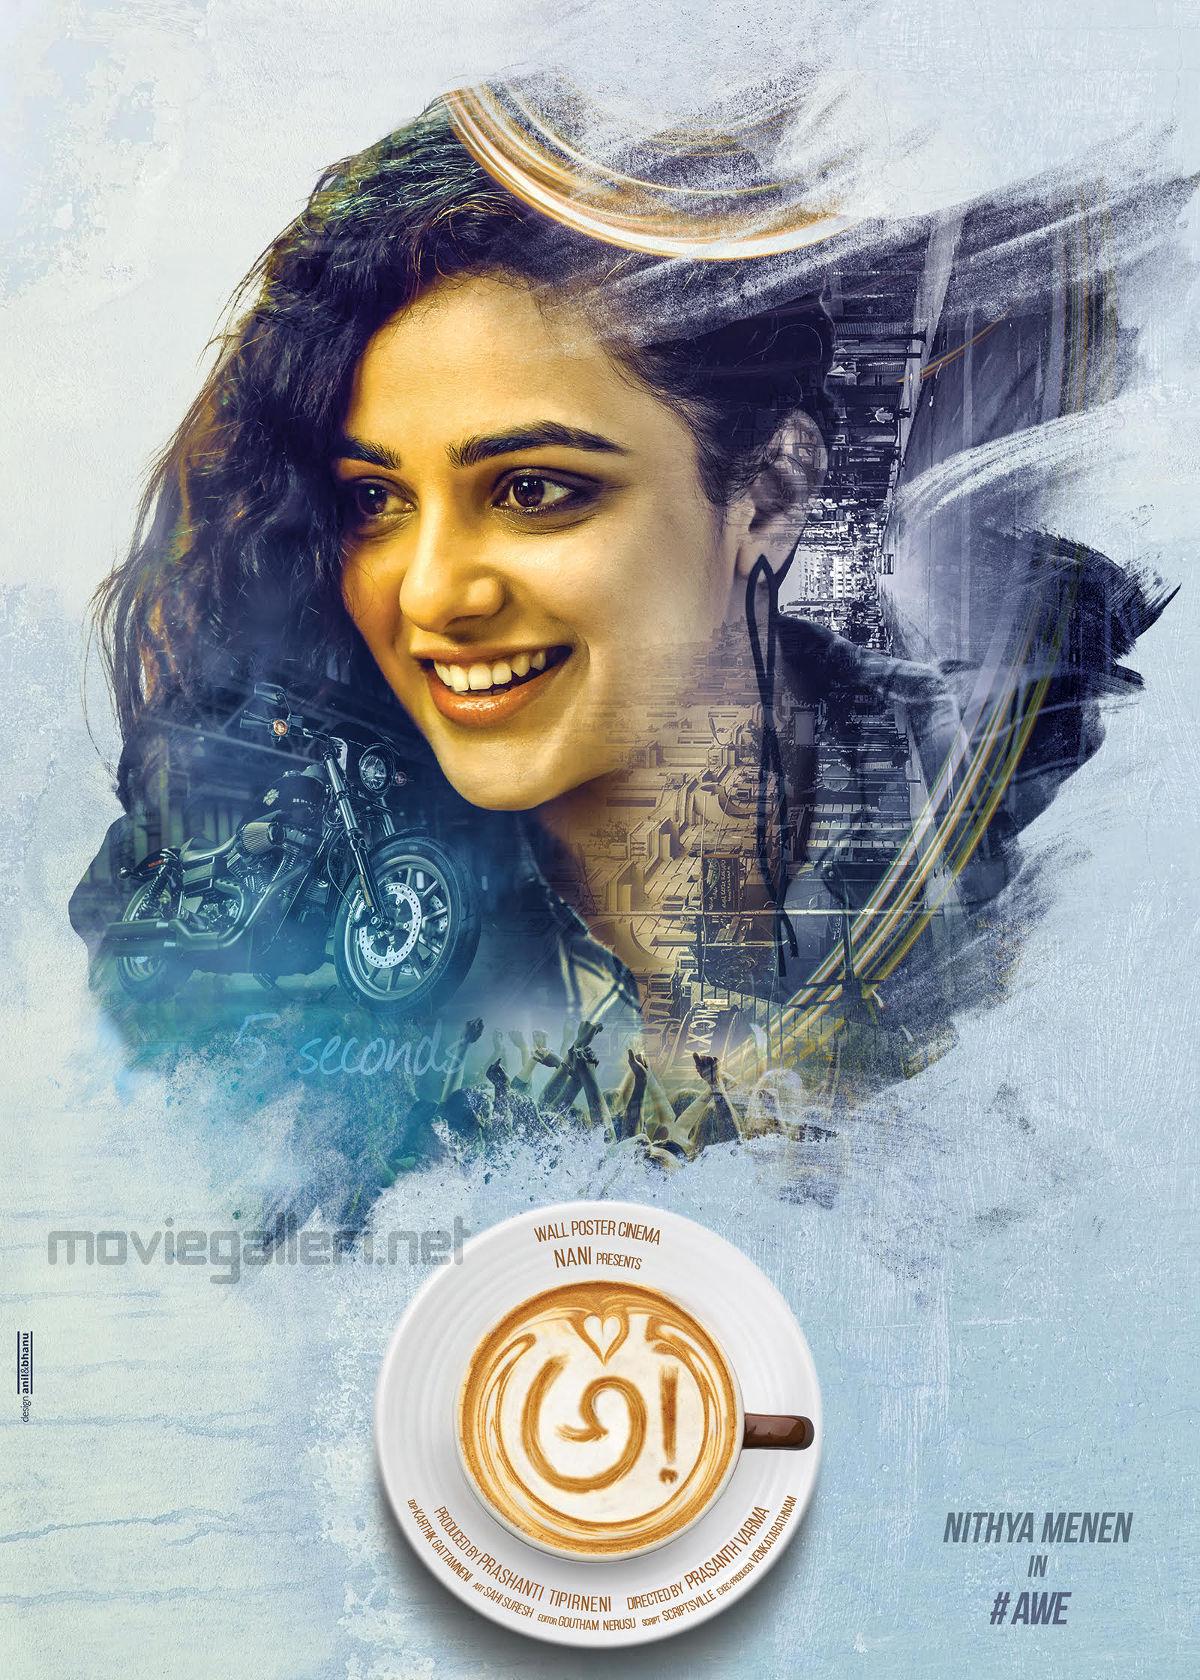 Actress Nithya Menen Awe First Look Poster HD